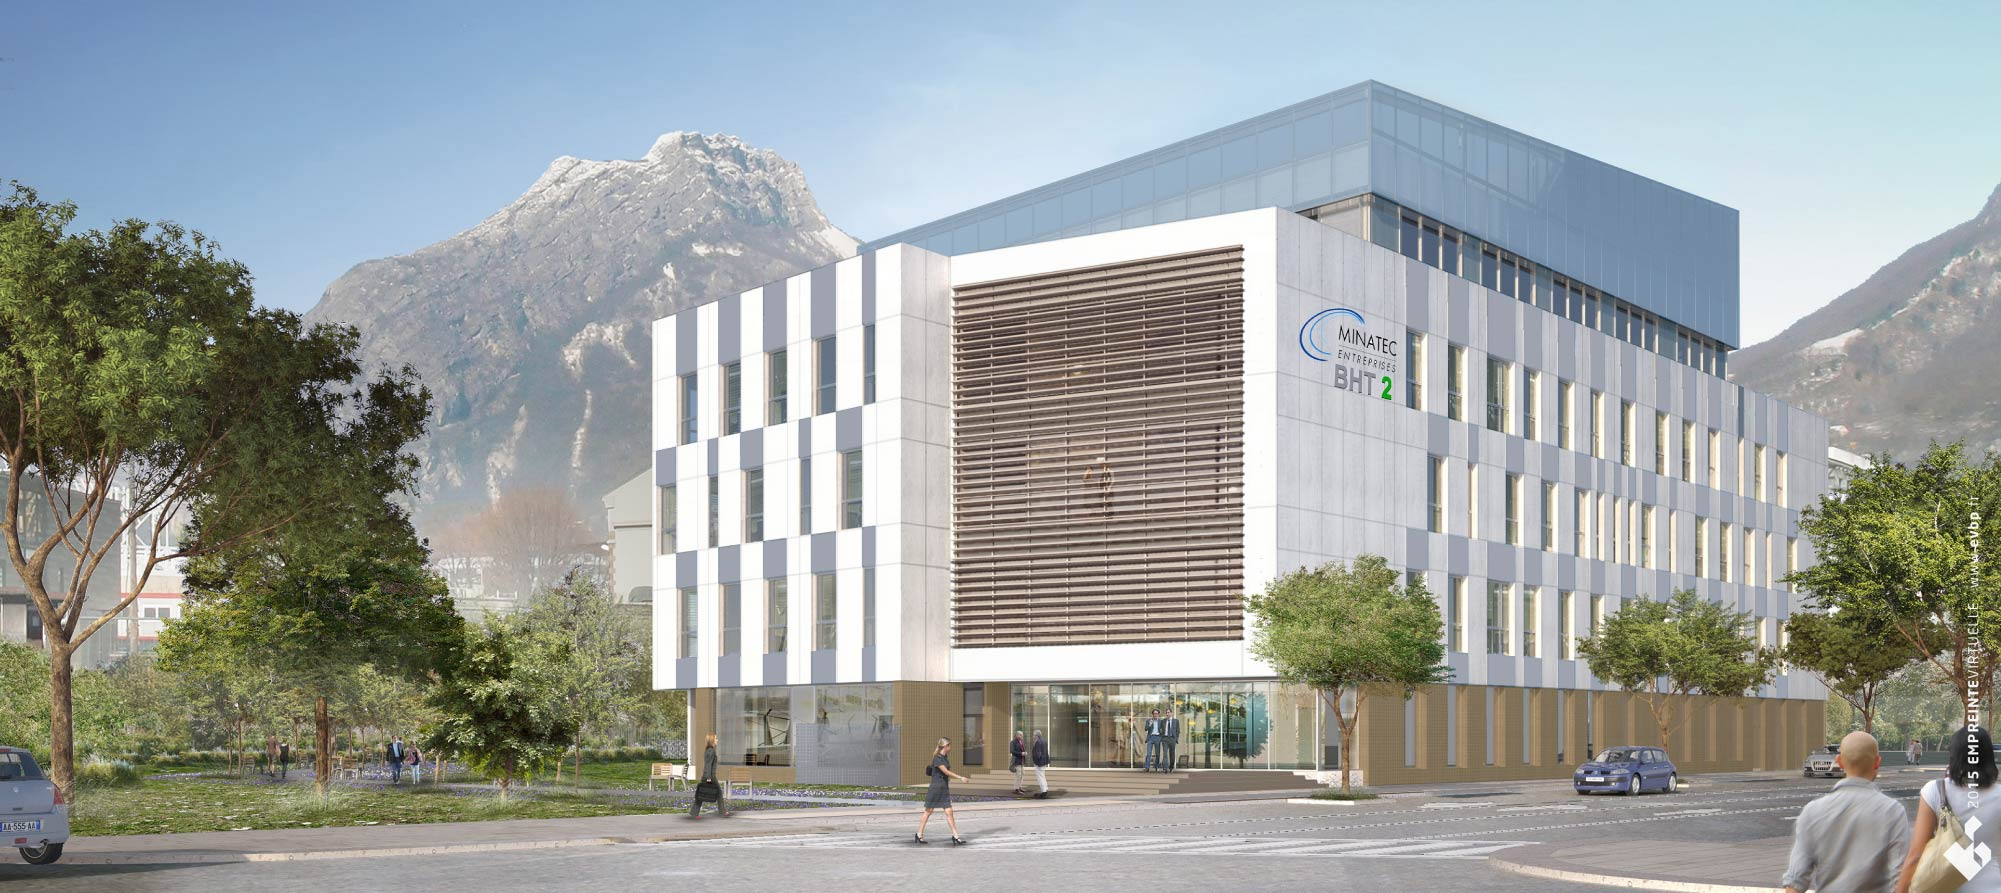 MINATEC Entreprises High-Tech Buildings in Grenoble